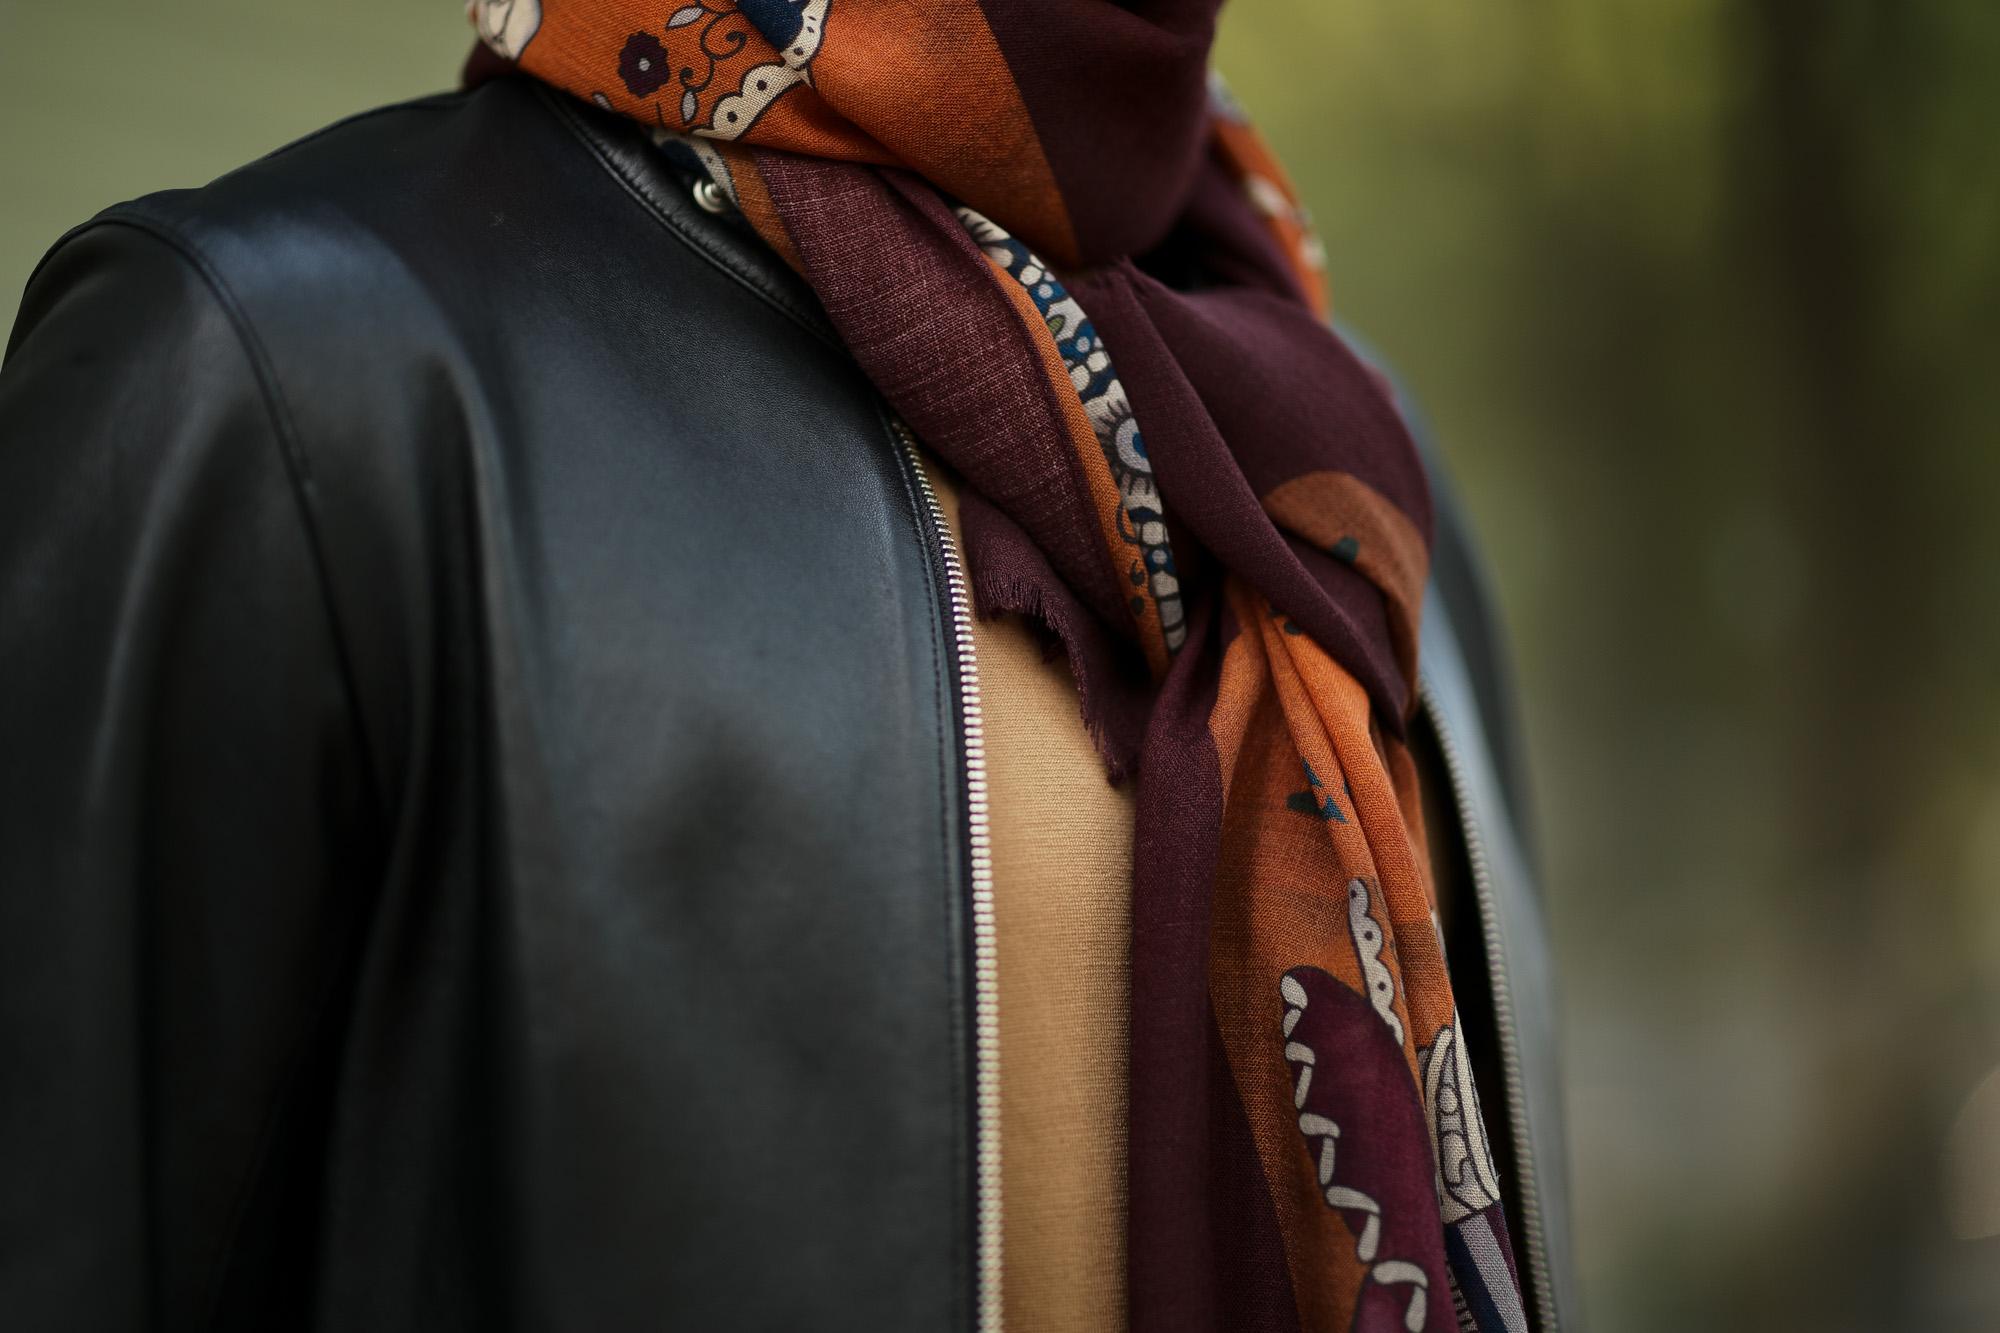 FRANCO BASSI (フランコバッシ) Wool Stole (ウール ストール) ウール プリント ストール BROWN (ブラウン・3) Made in italy (イタリア製) 2018 秋冬新作 francobassi 愛知 名古屋 altoediritto アルトエデリット